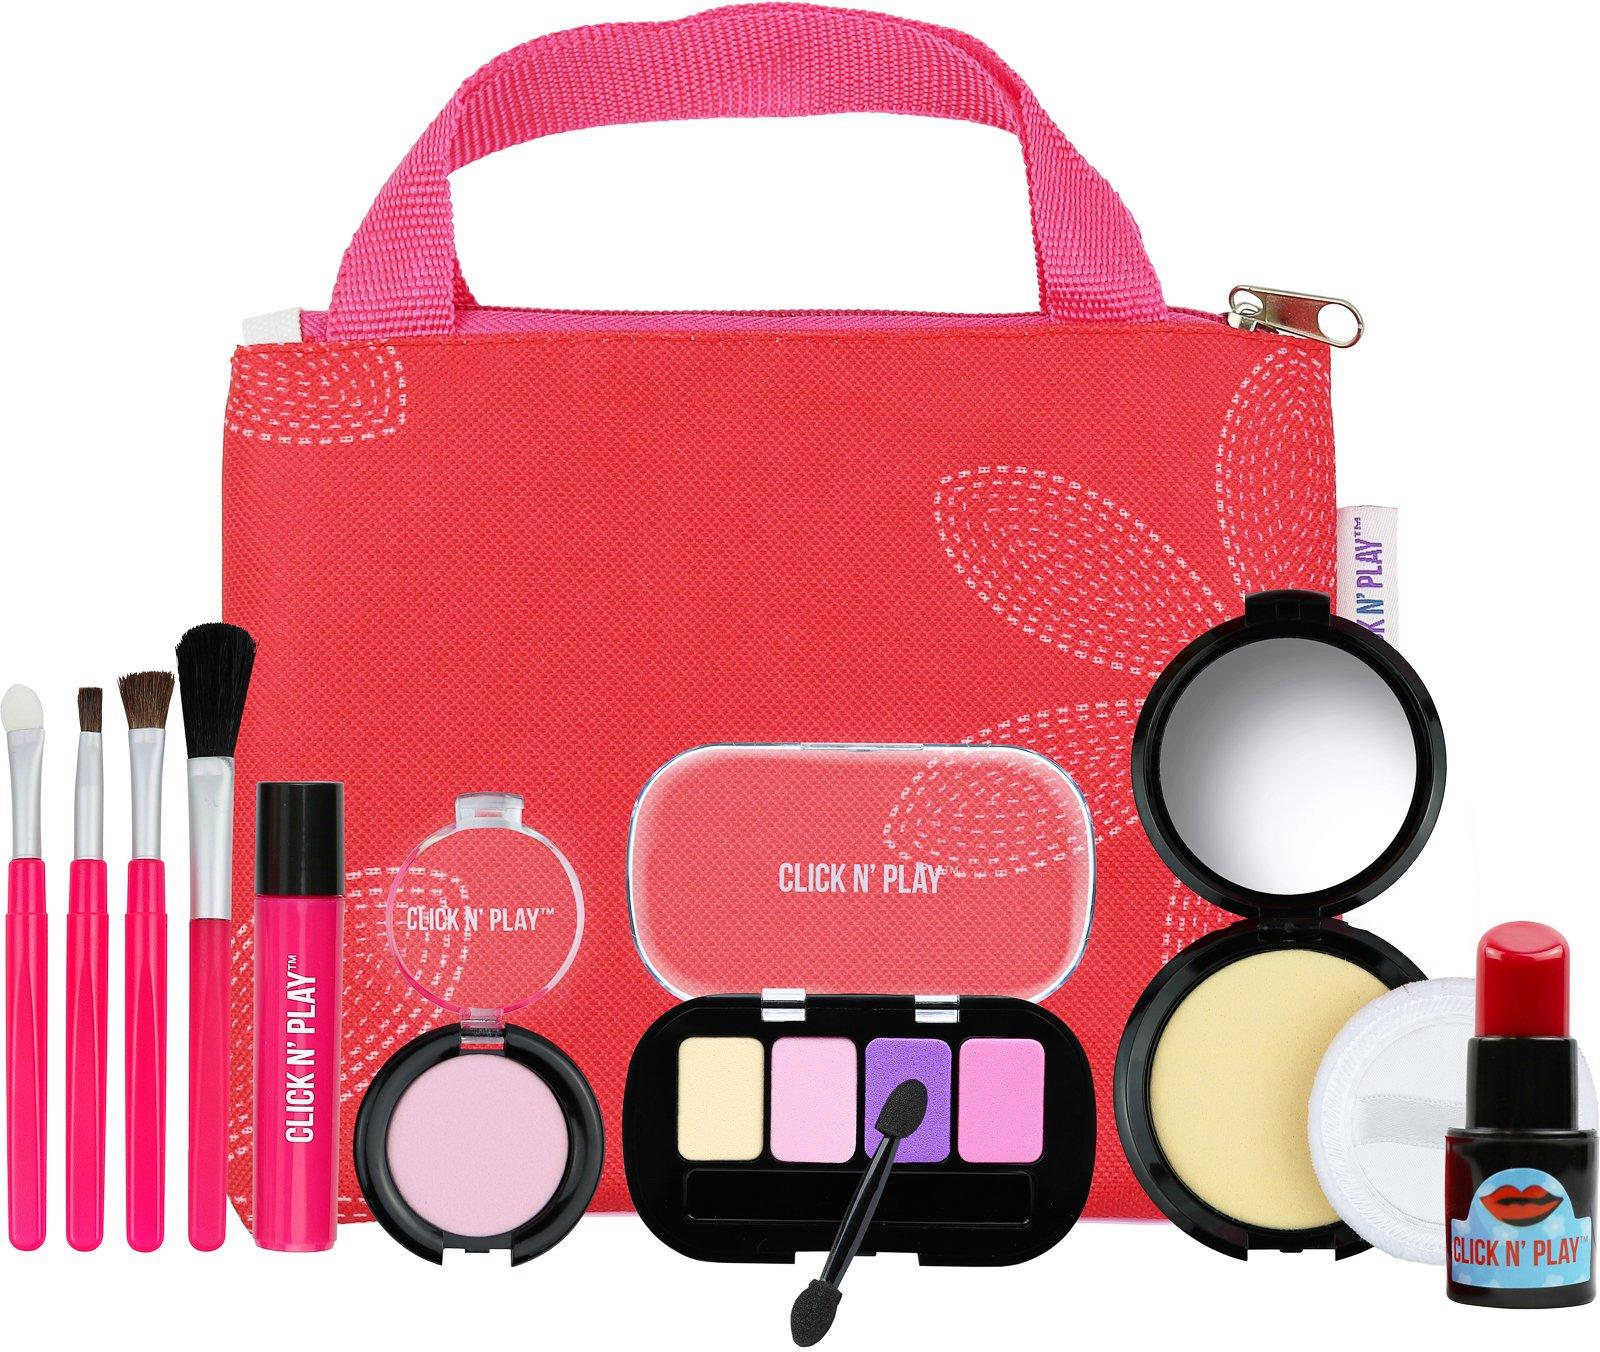 Click N' Play Pretend Play Cosmetic & Makeup Signature Essential Bag Set